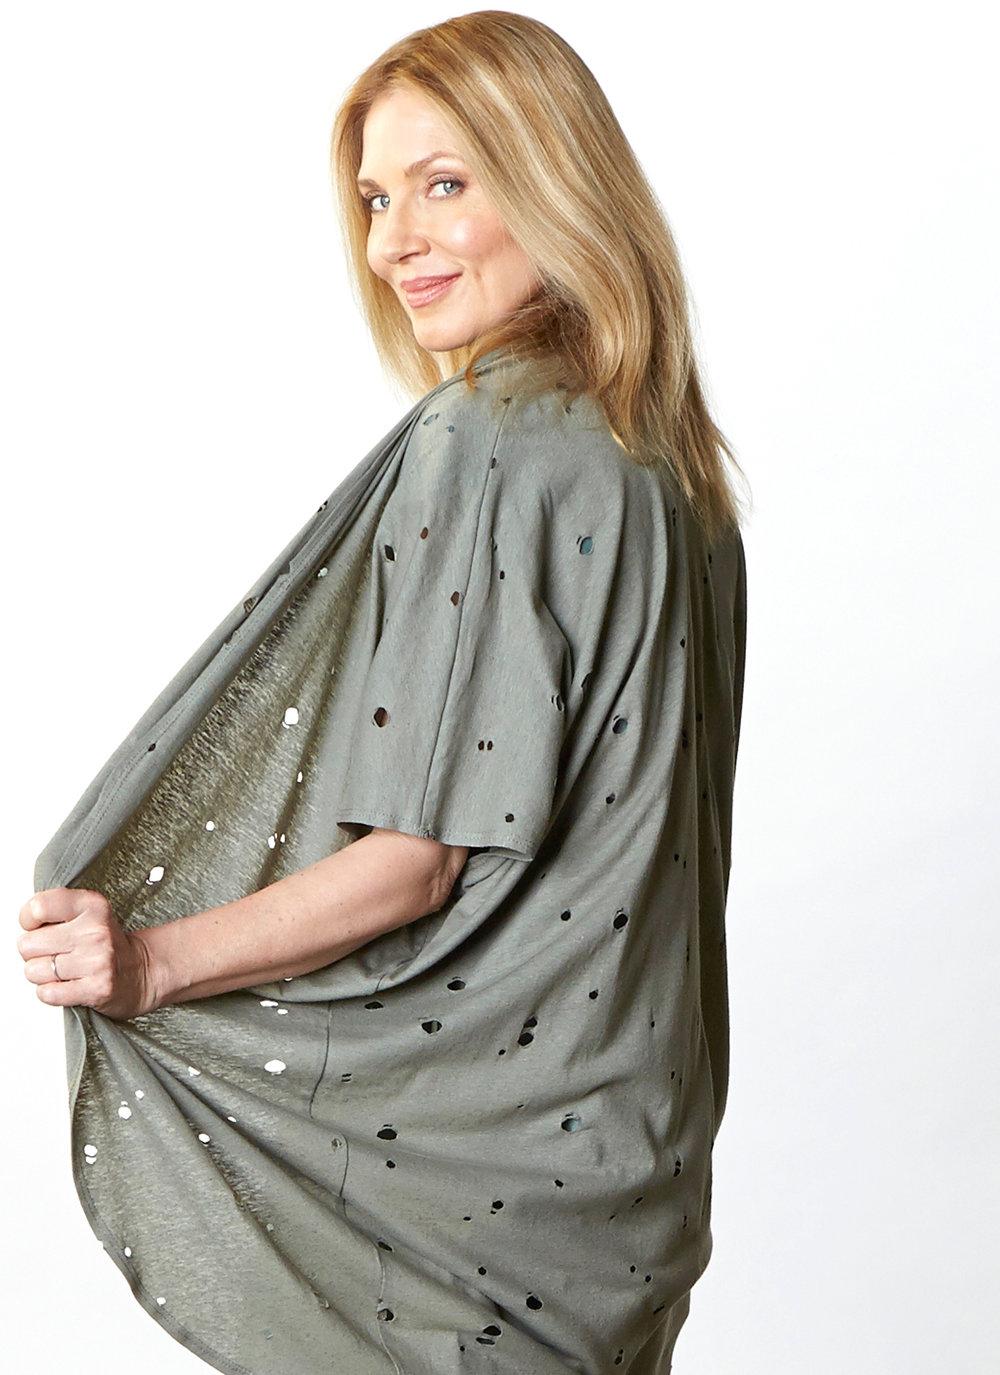 Annette Cardigan in Olive Italian Fori Jersey